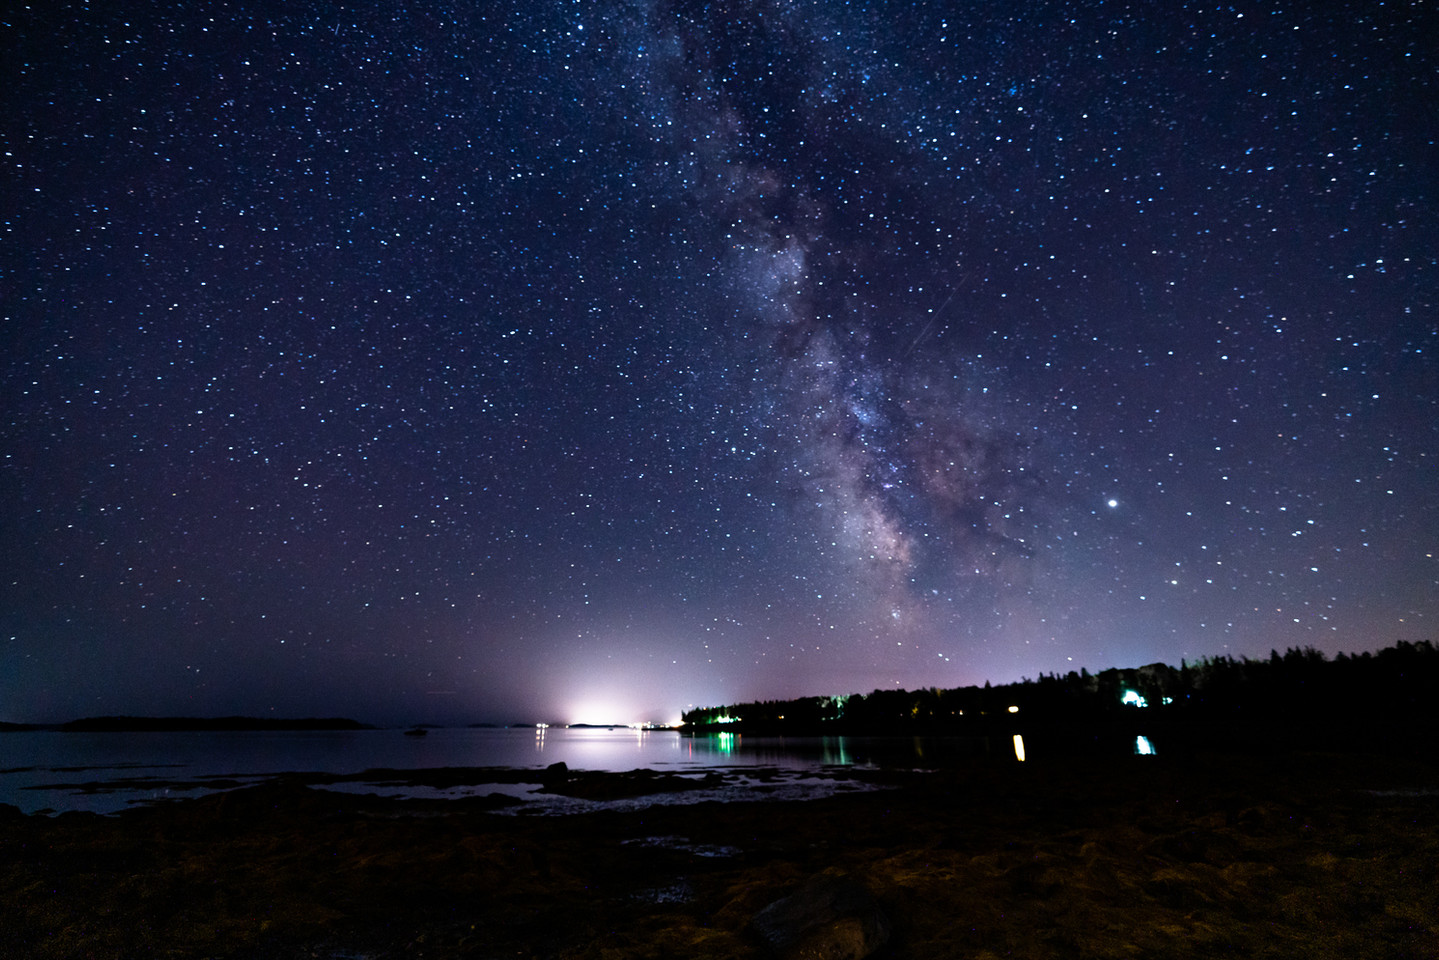 Milkyway at Acadia